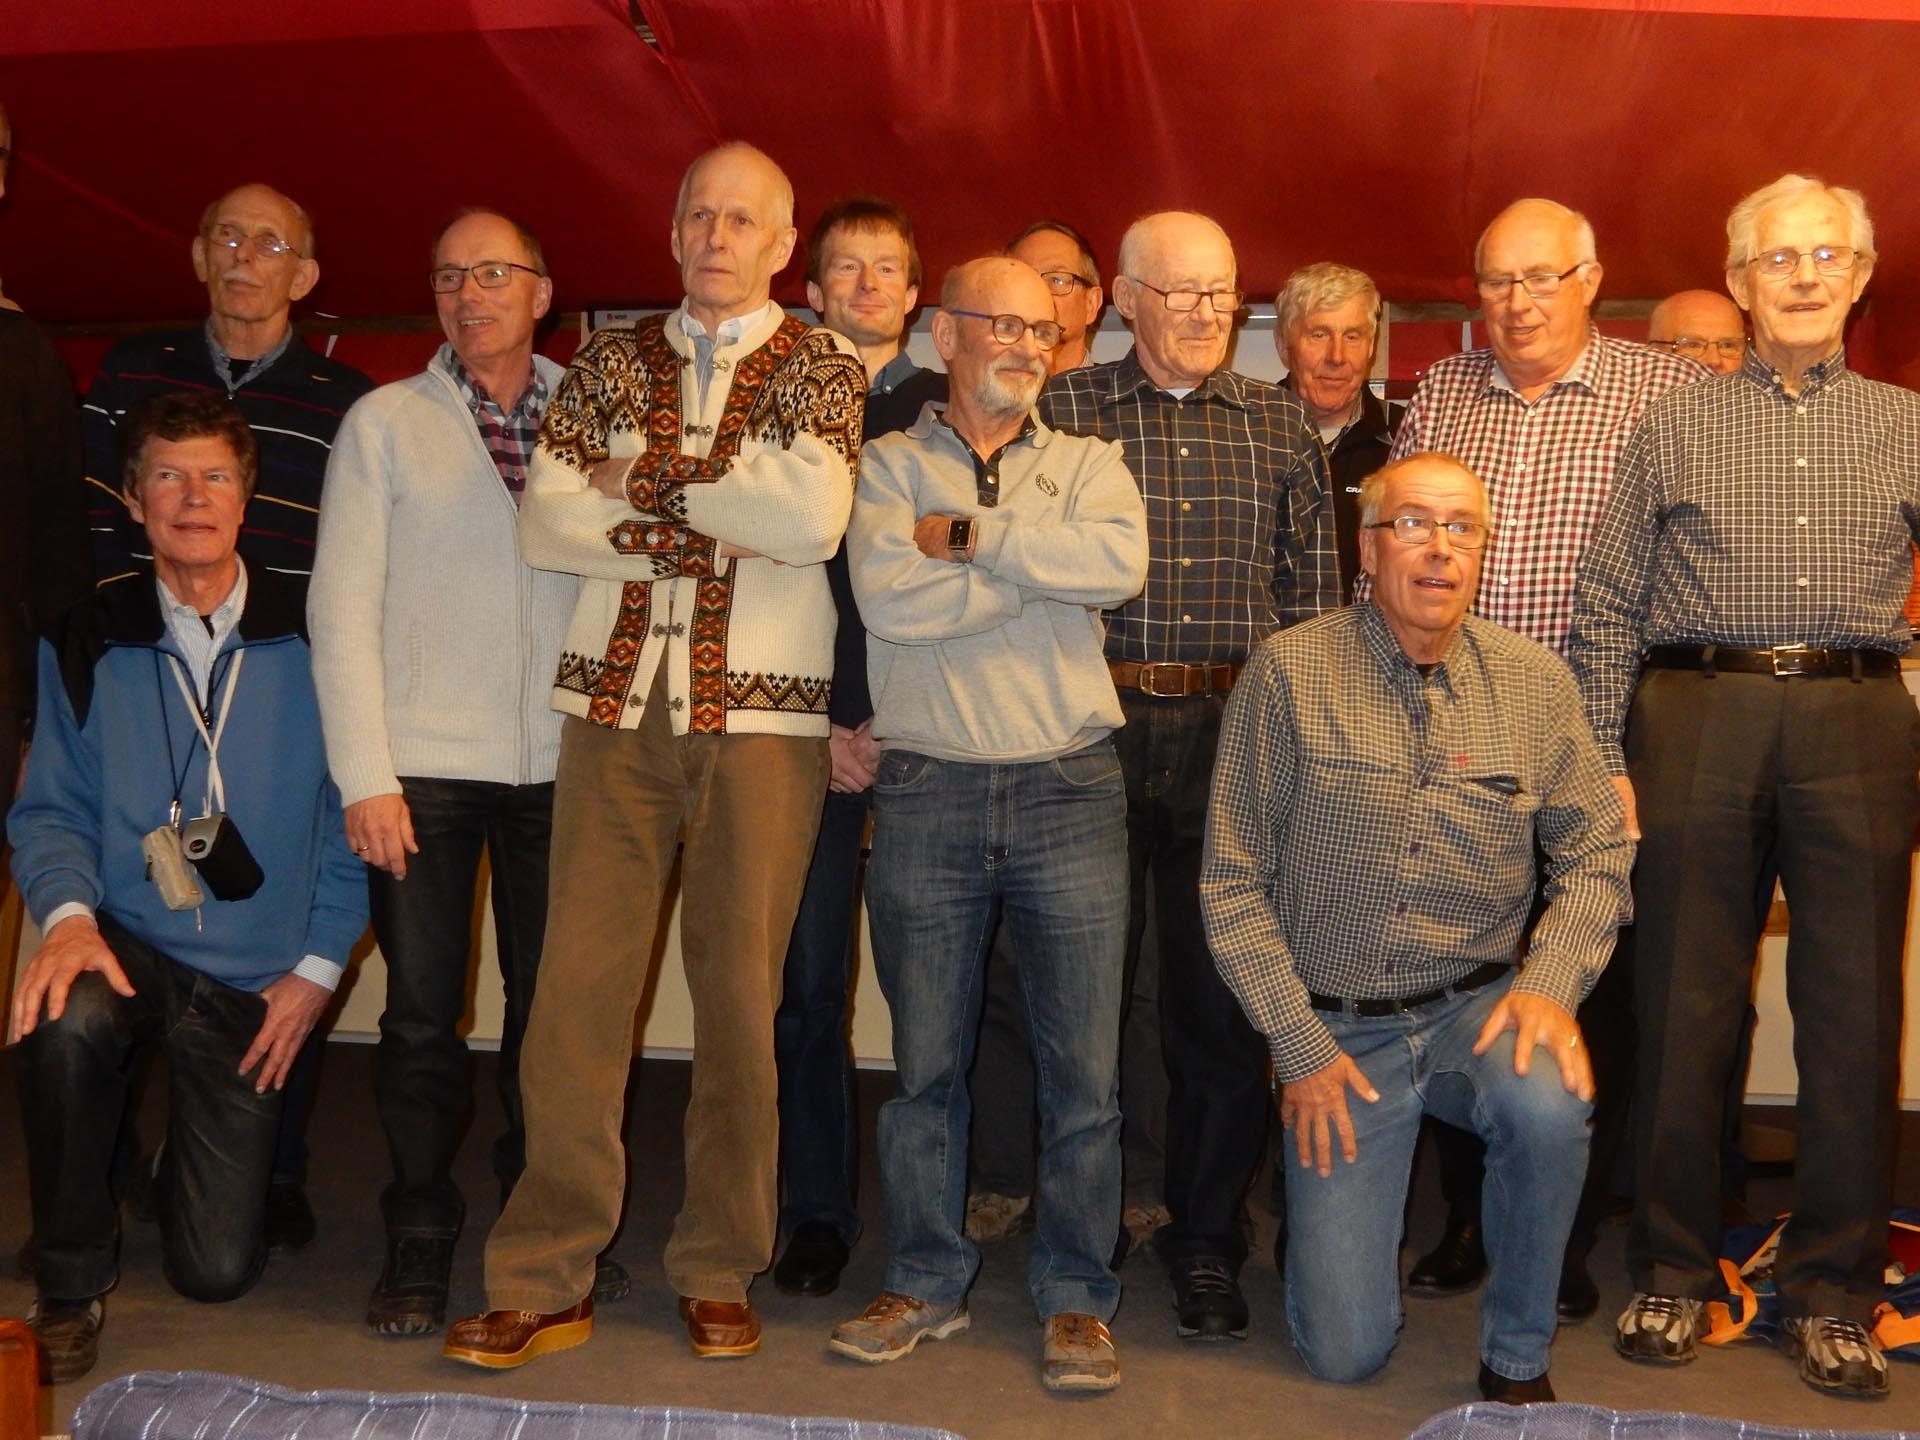 Foto Göthe Persson, Några Vasaloppsveteraner i Tyringe